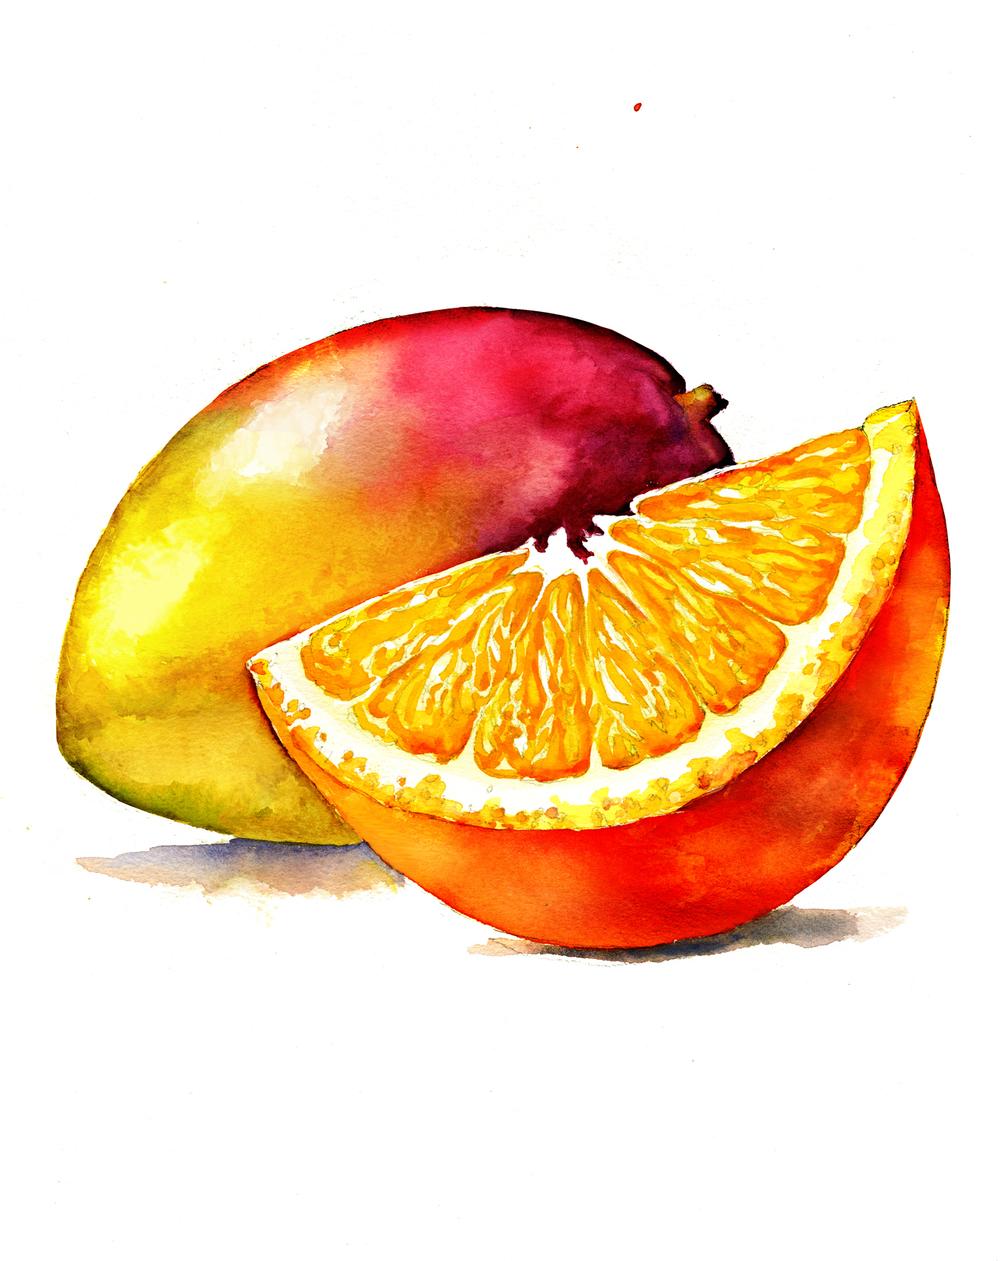 nantucket orangemango revise #2 150.jpg